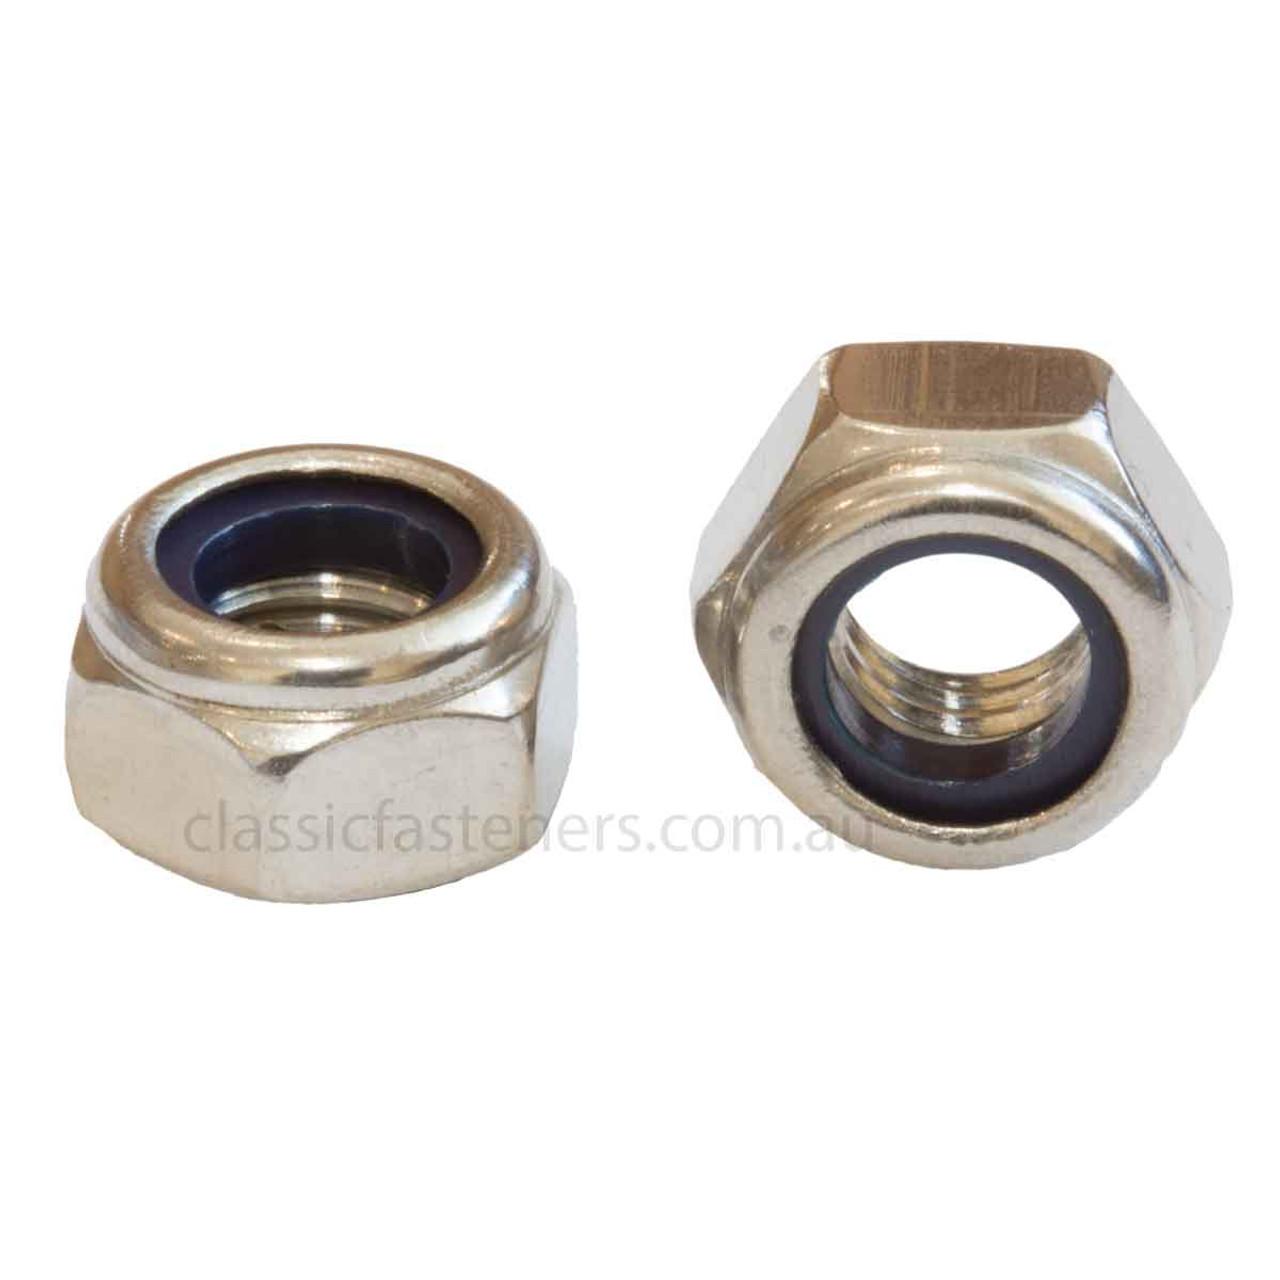 Qty 100 Stainless Steel Nylon Insert Lock Nut Metric 8M x 1.25